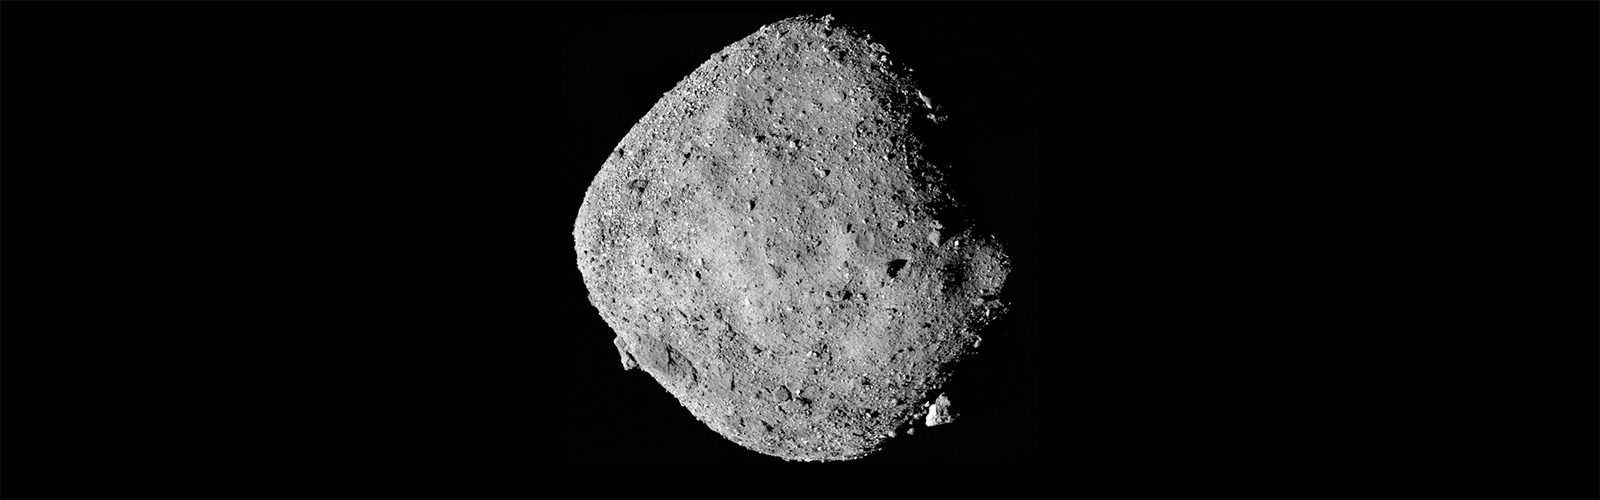 in depth mercury nasa solar system exploration - 1600×500